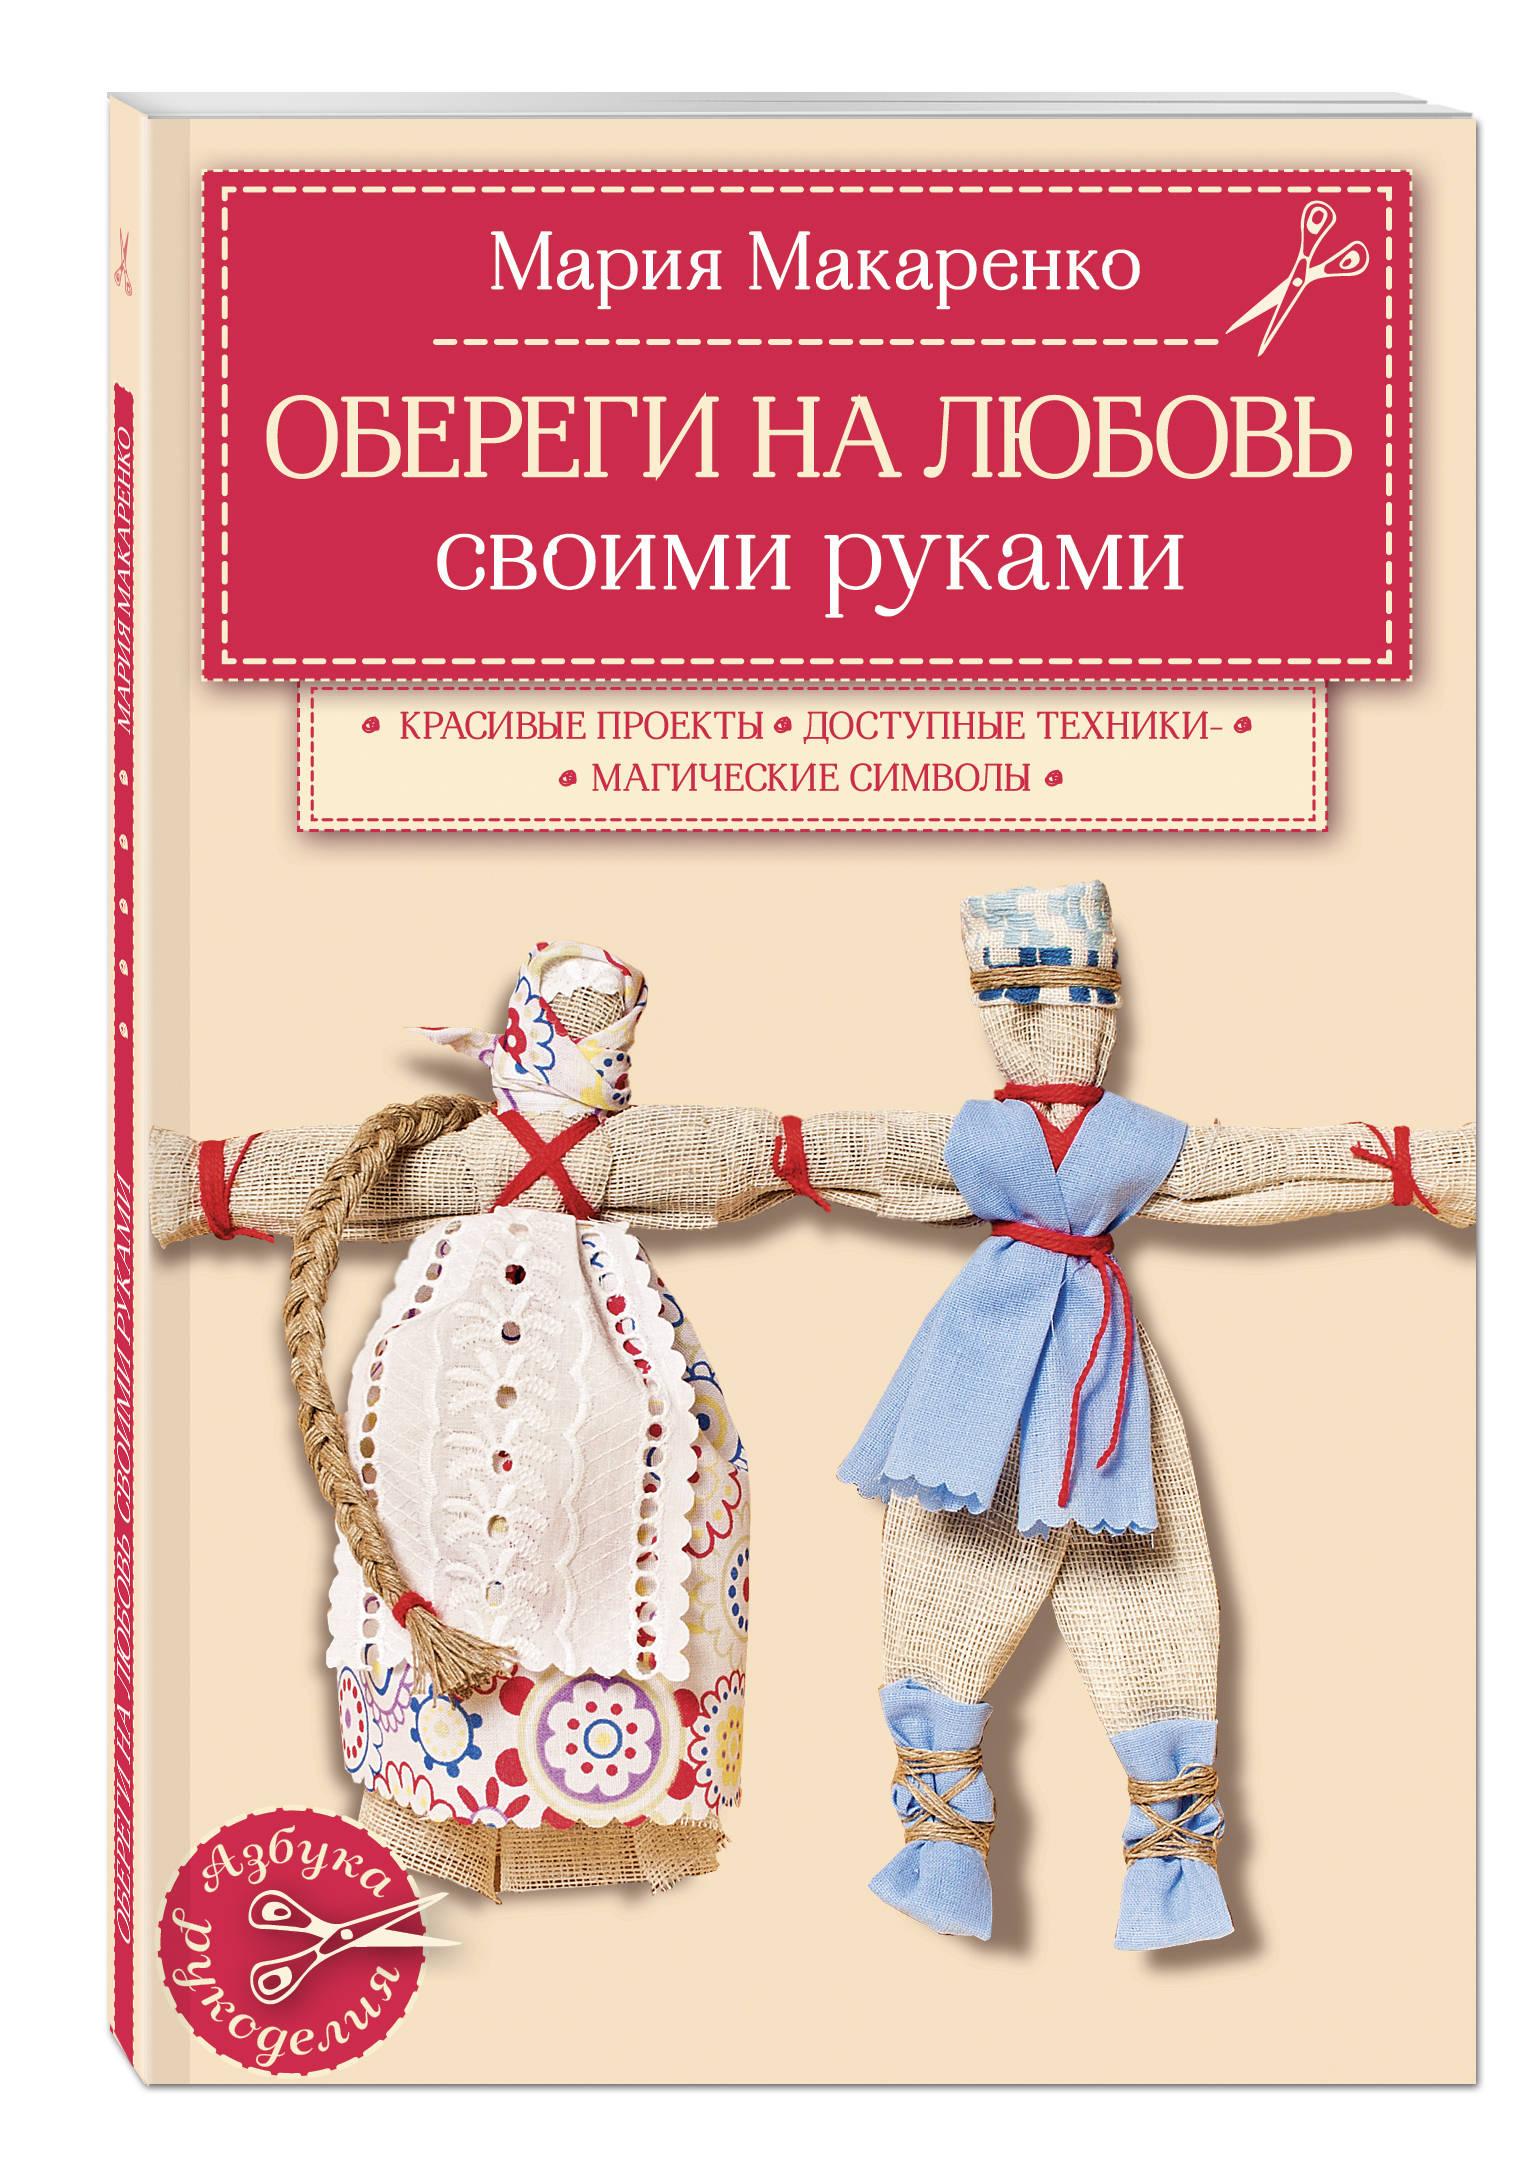 Макаренко М.К. Обереги на любовь обереги на любовь